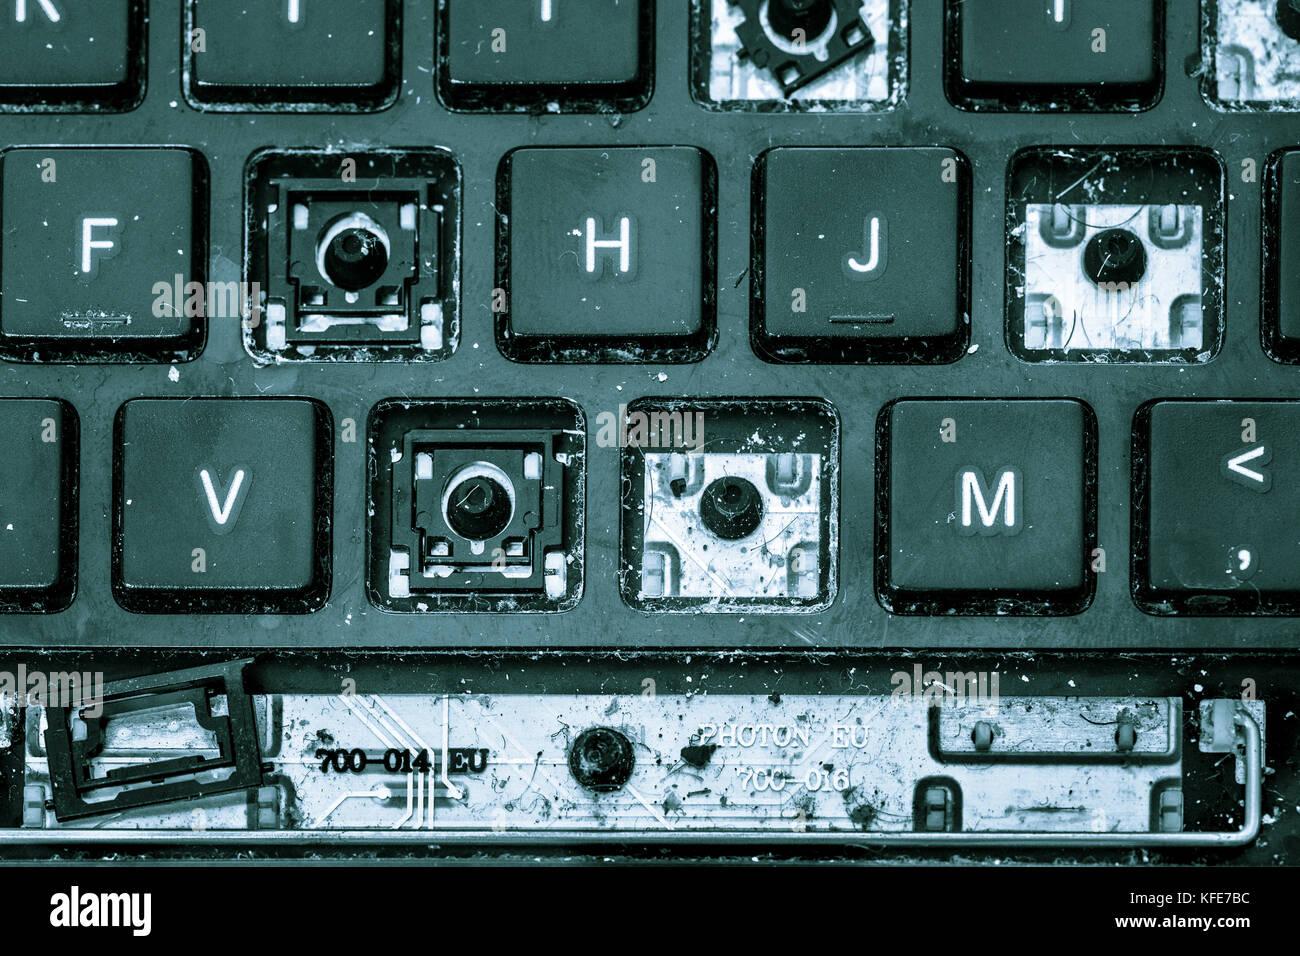 how to fix broken shift key on laptop